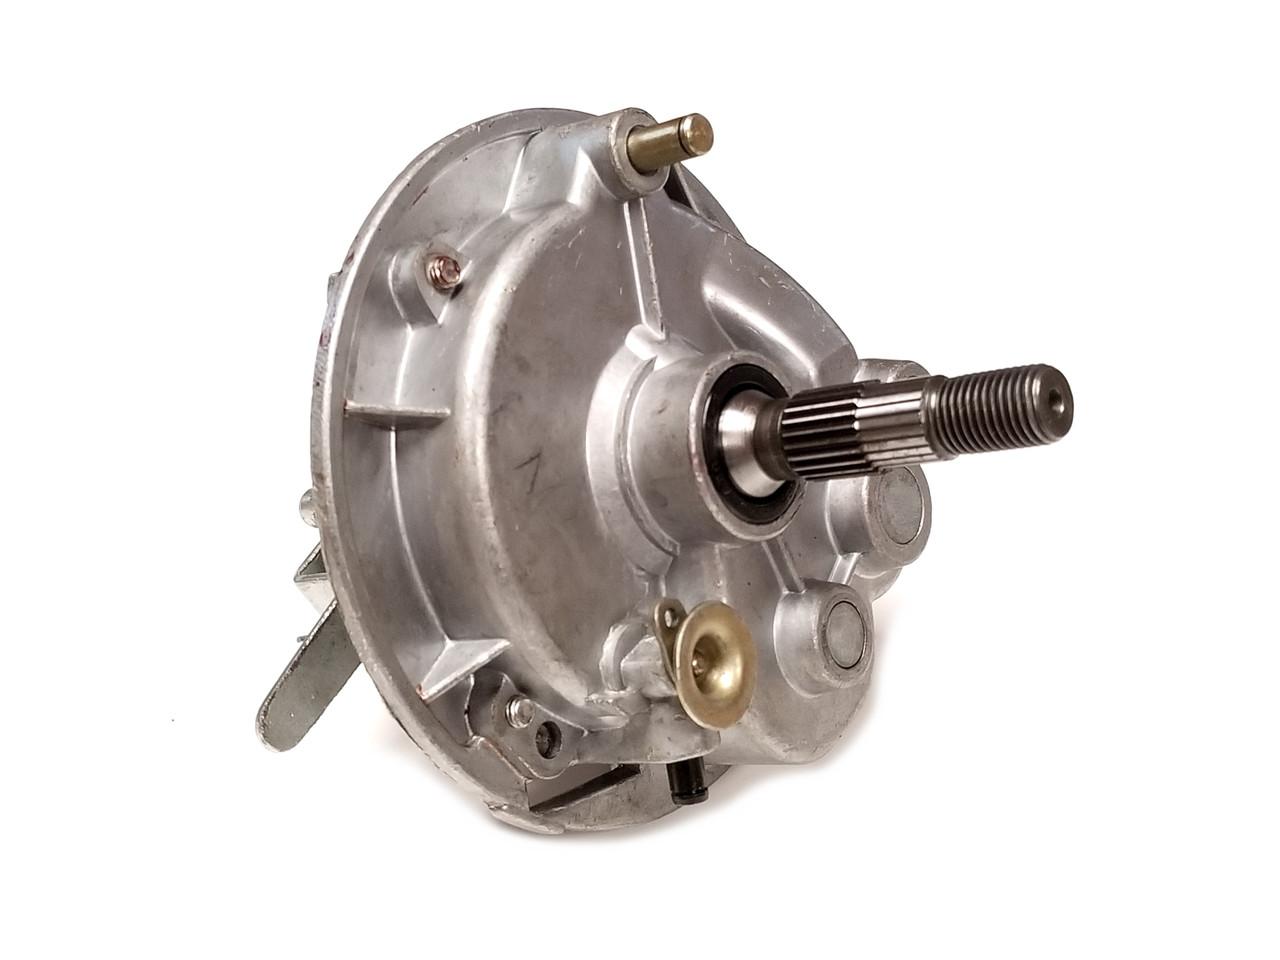 Original Kinetic Variated Transmission Gear Box